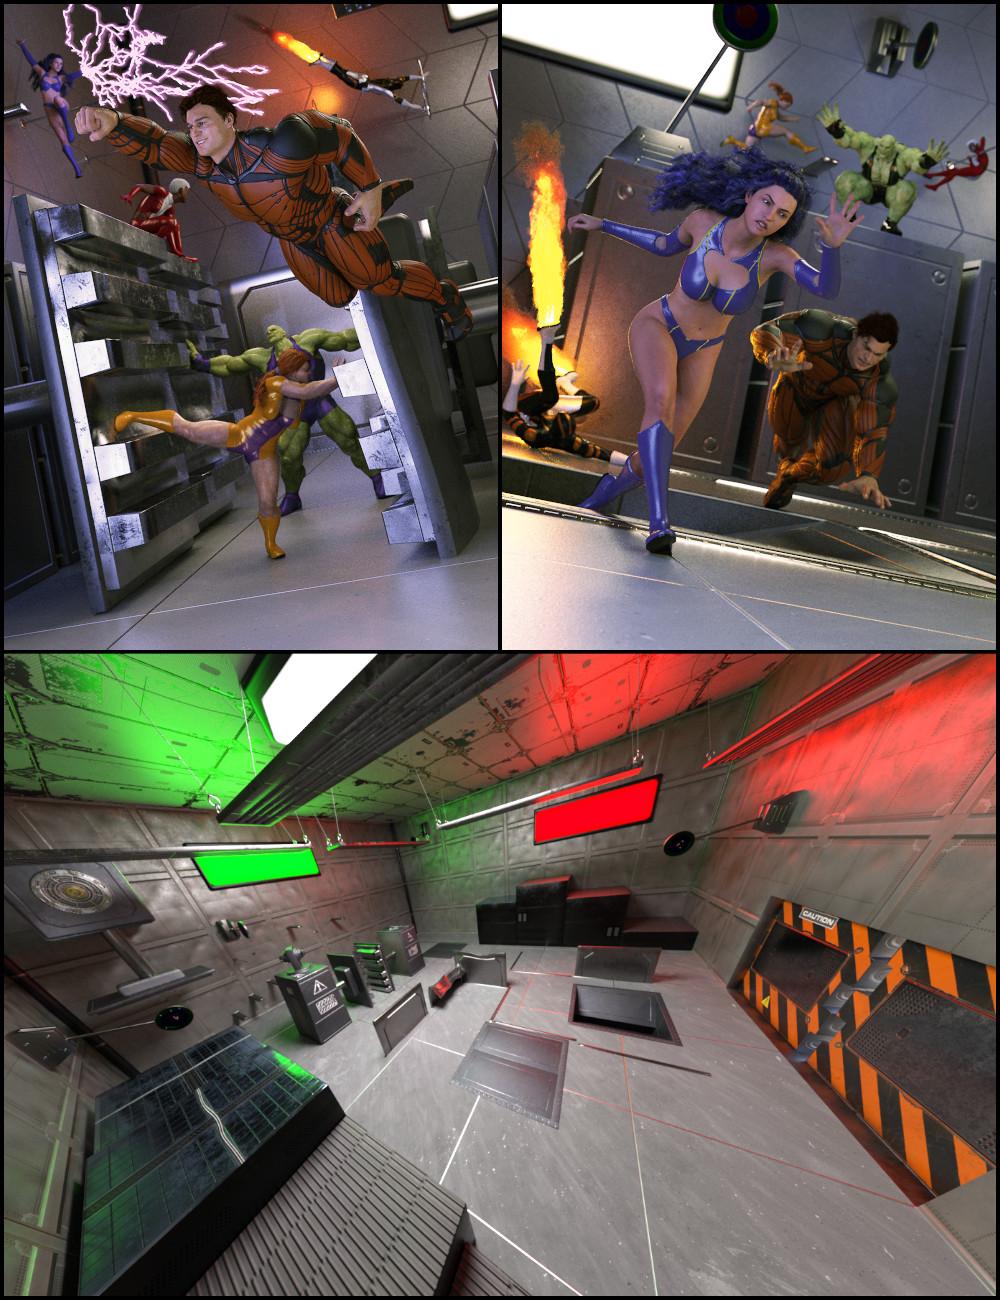 Superhero Training Bundle by: FeralFeySilent Winter, 3D Models by Daz 3D